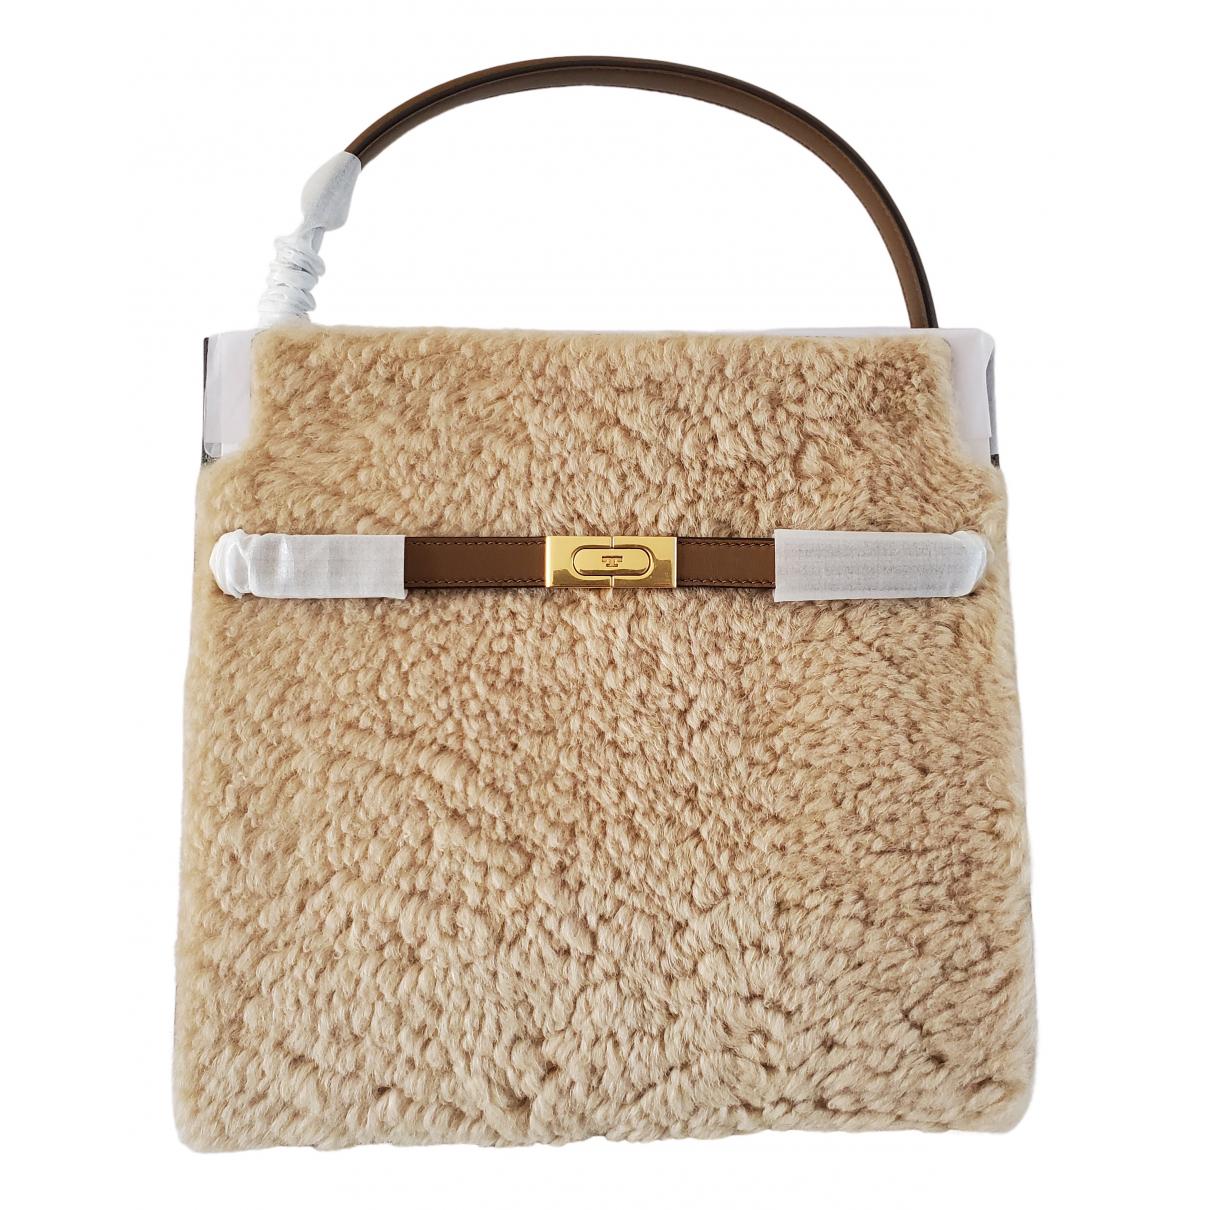 Tory Burch \N Handtasche in  Kamel Wolle